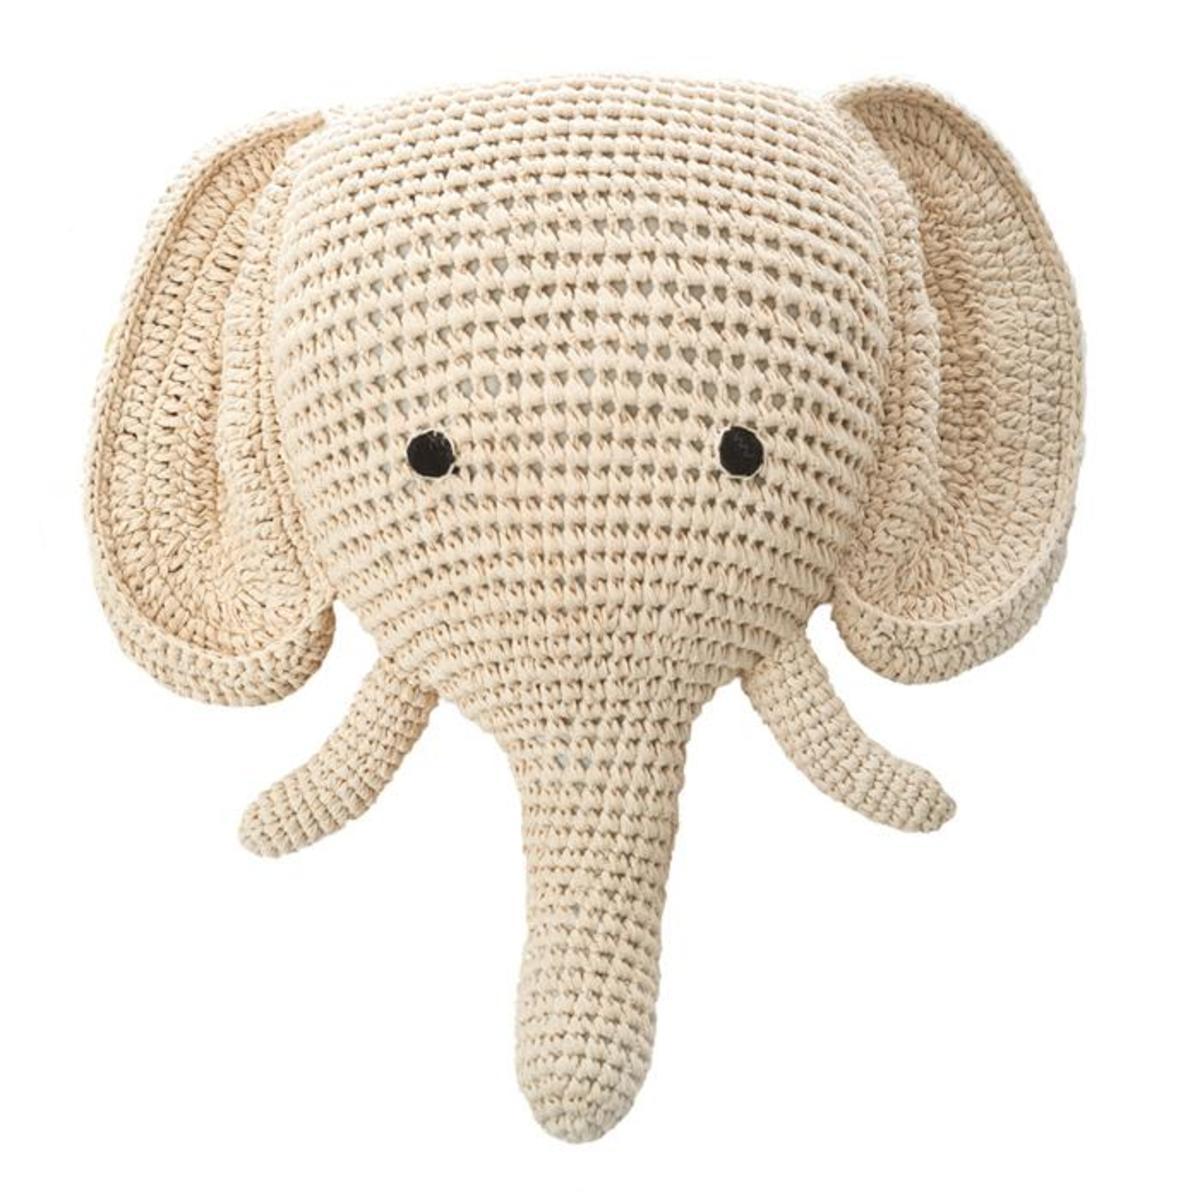 Amigurumi Crochet Elephant Pattern | Supergurumi | 1200x1200